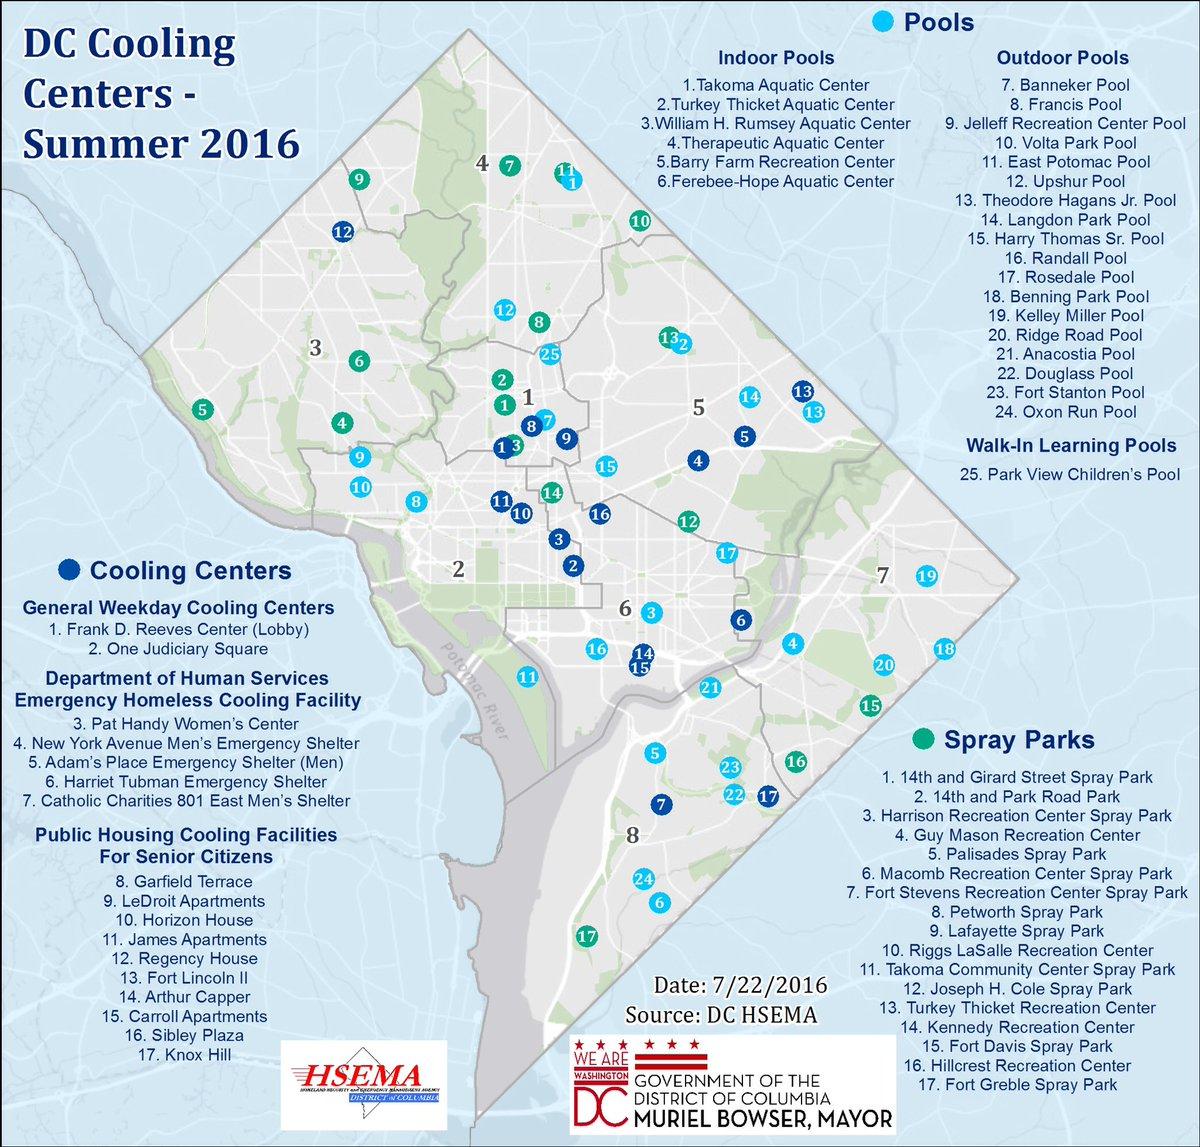 To find a DC cooling center visit https://t.co/vp7C75dV9r. ^GC https://t.co/GOovhLgJih